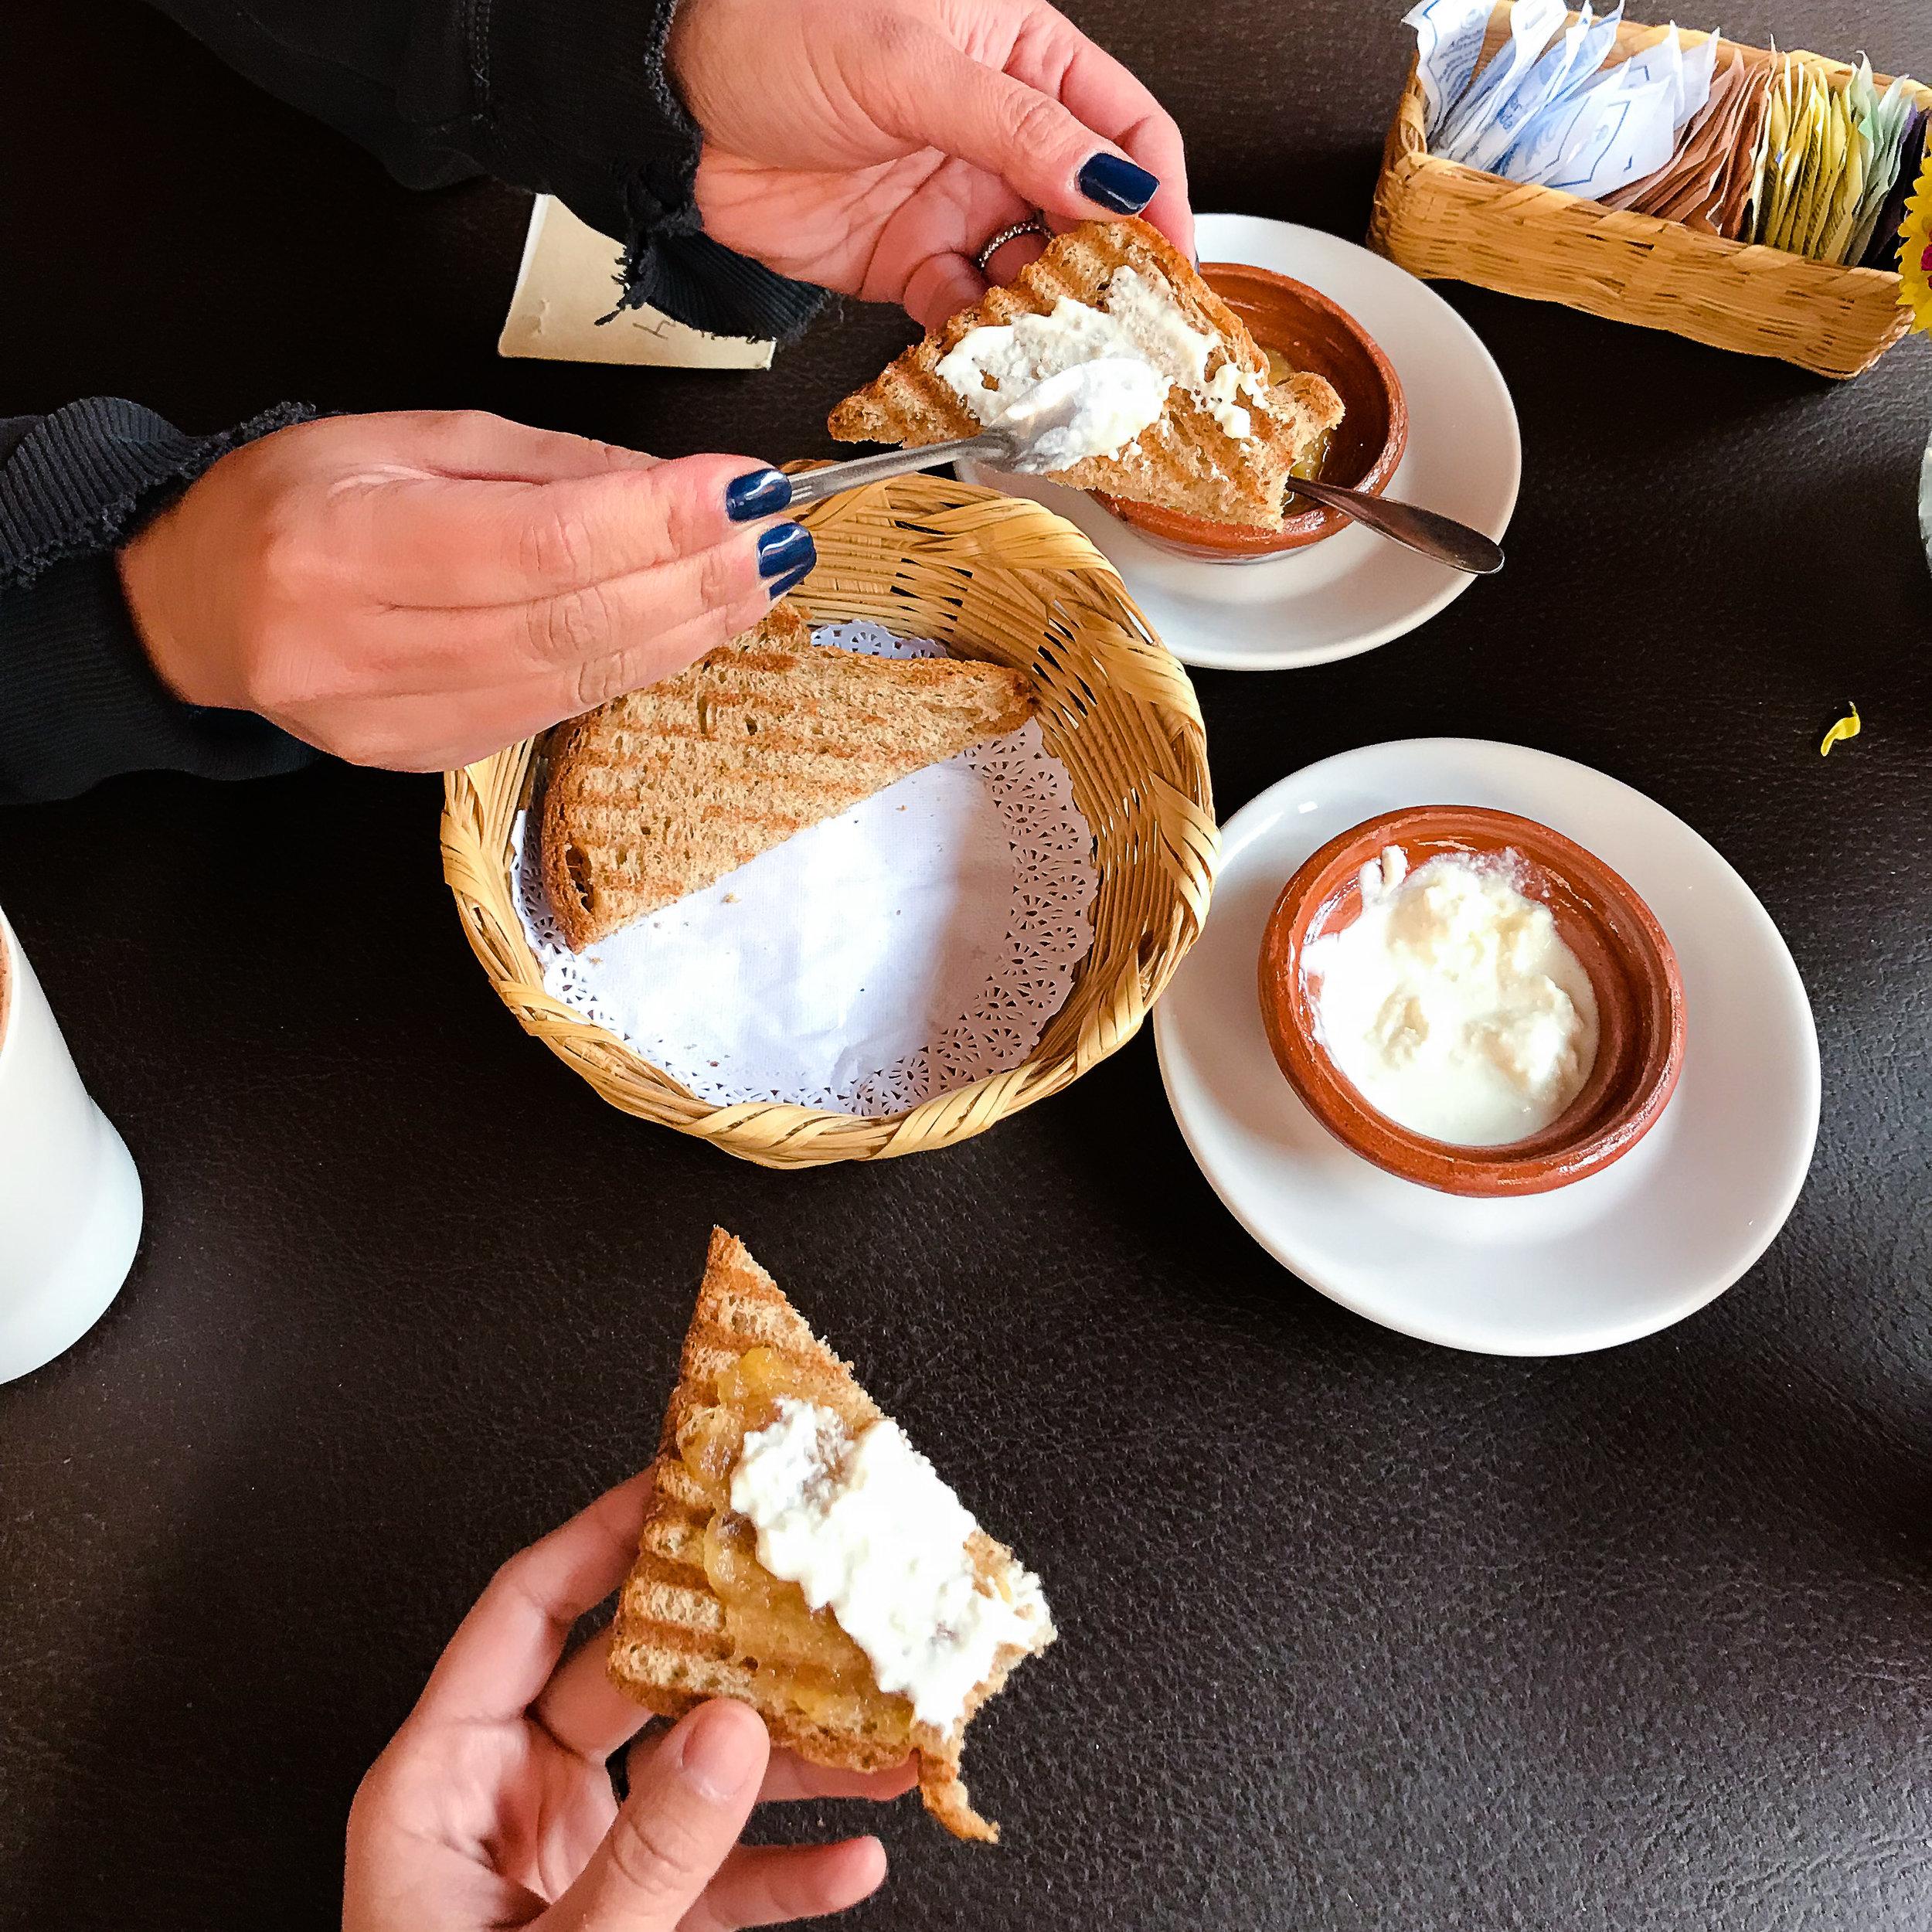 mexican-food-san-miguel-de-allende-restuarants-coffee-cafes-4.jpg